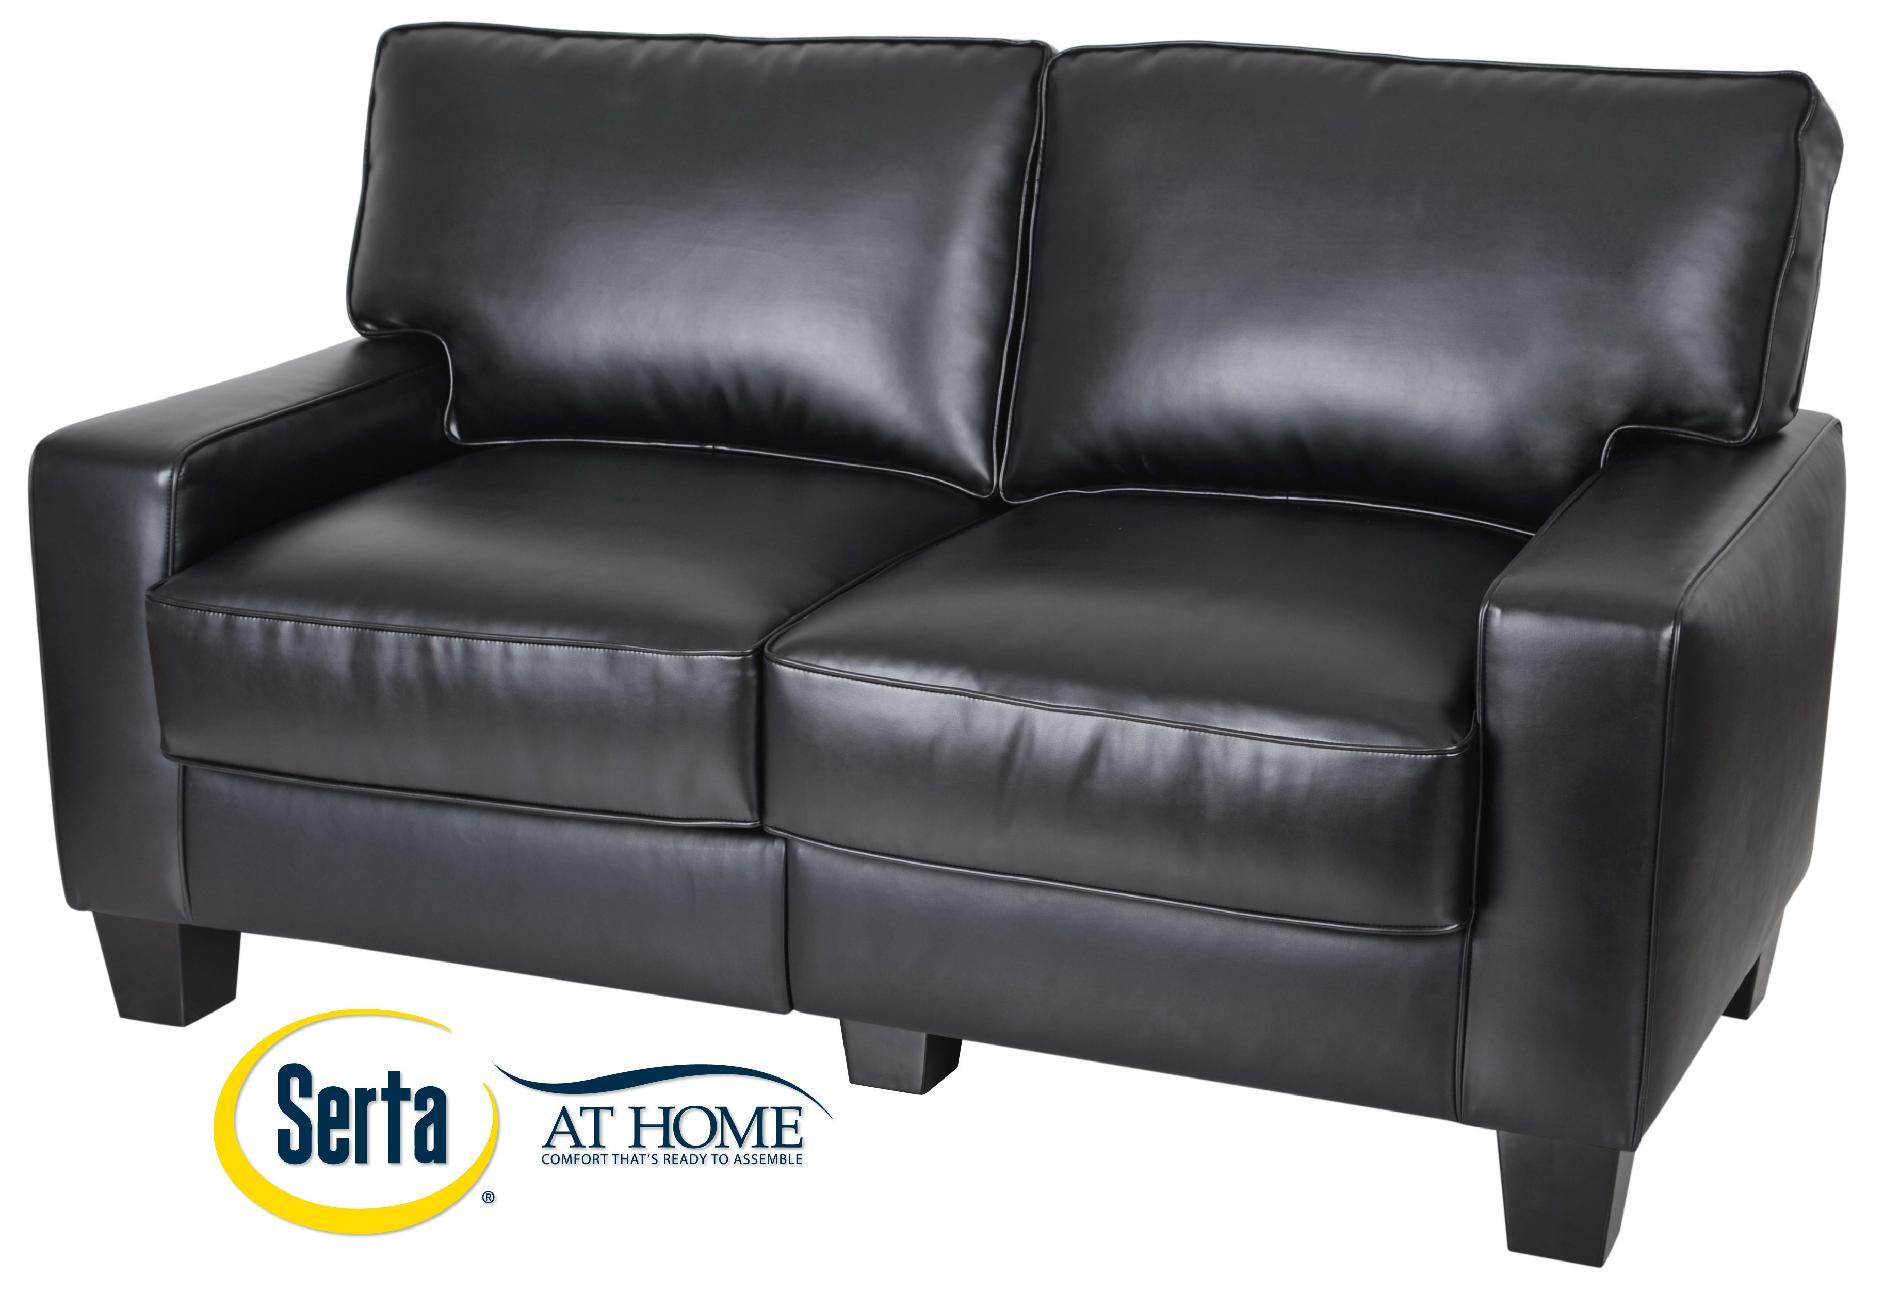 Serta at Home Santa Rosa Black Leather 60